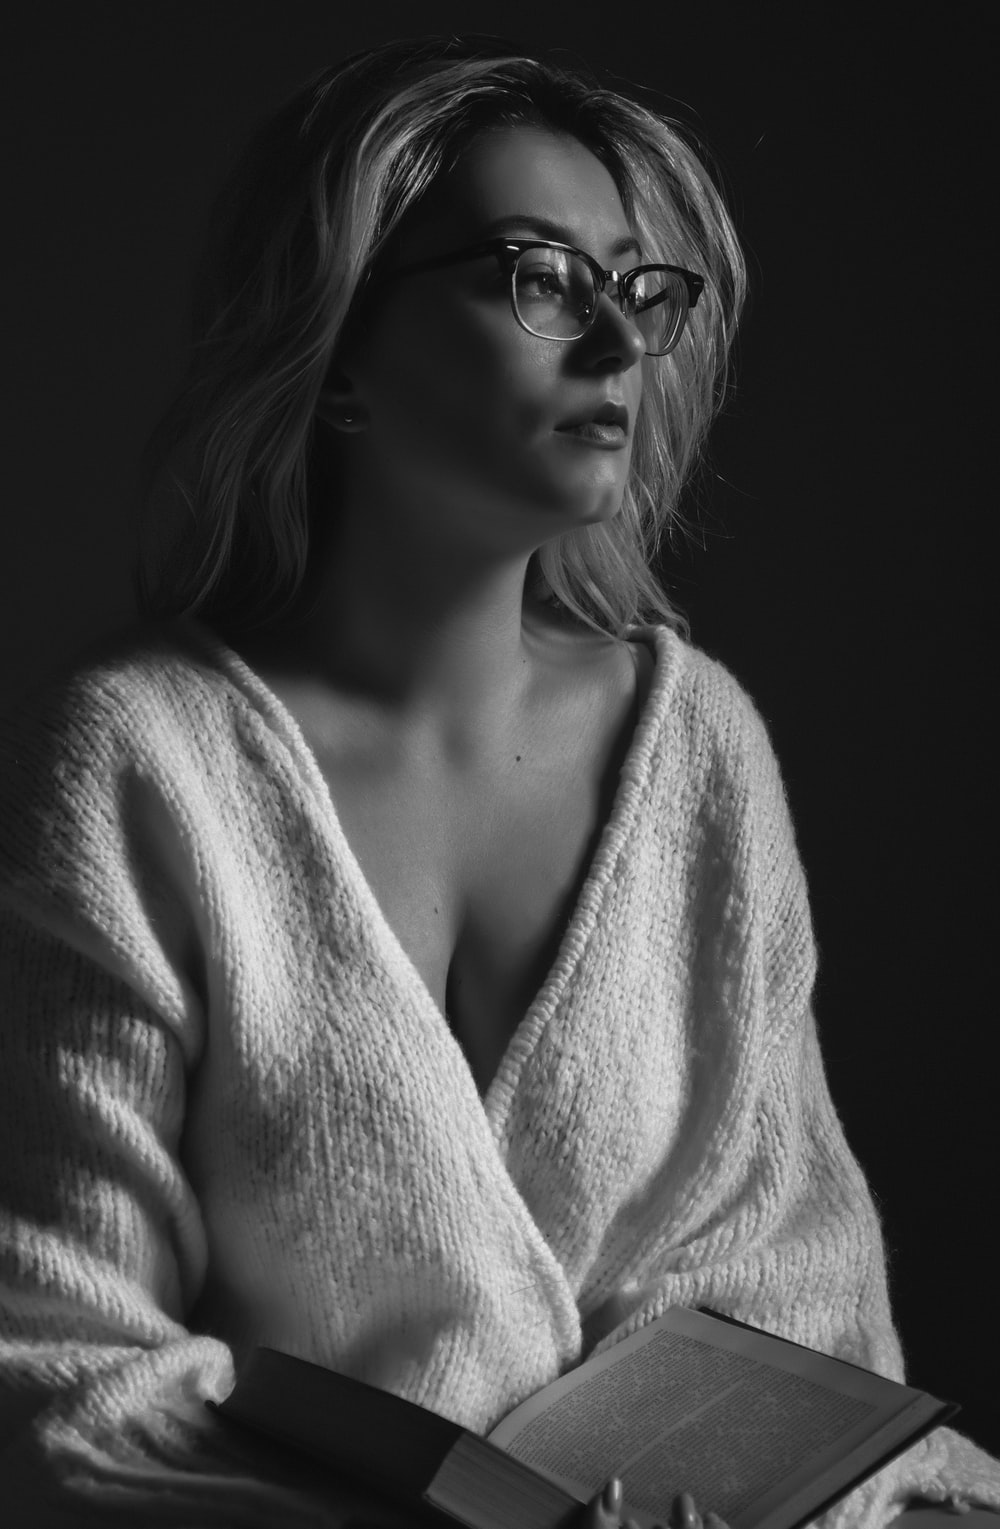 woman in white knit sweater wearing black sunglasses